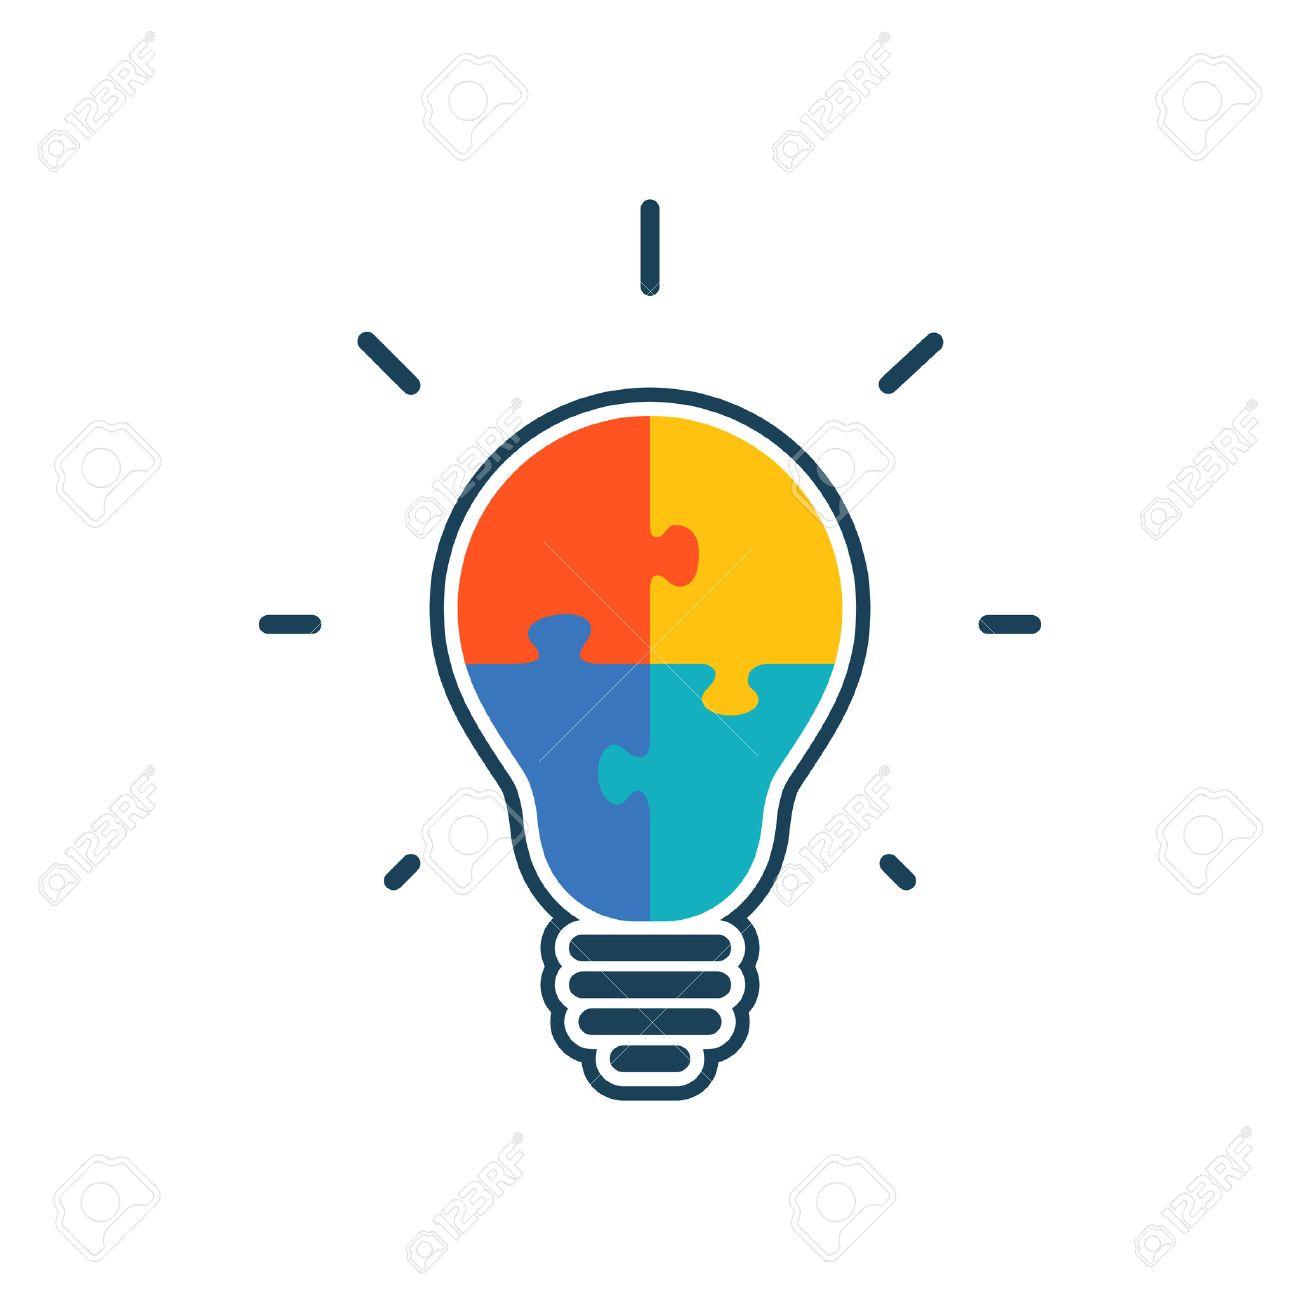 Free download clip art. Puzzle clipart light bulb